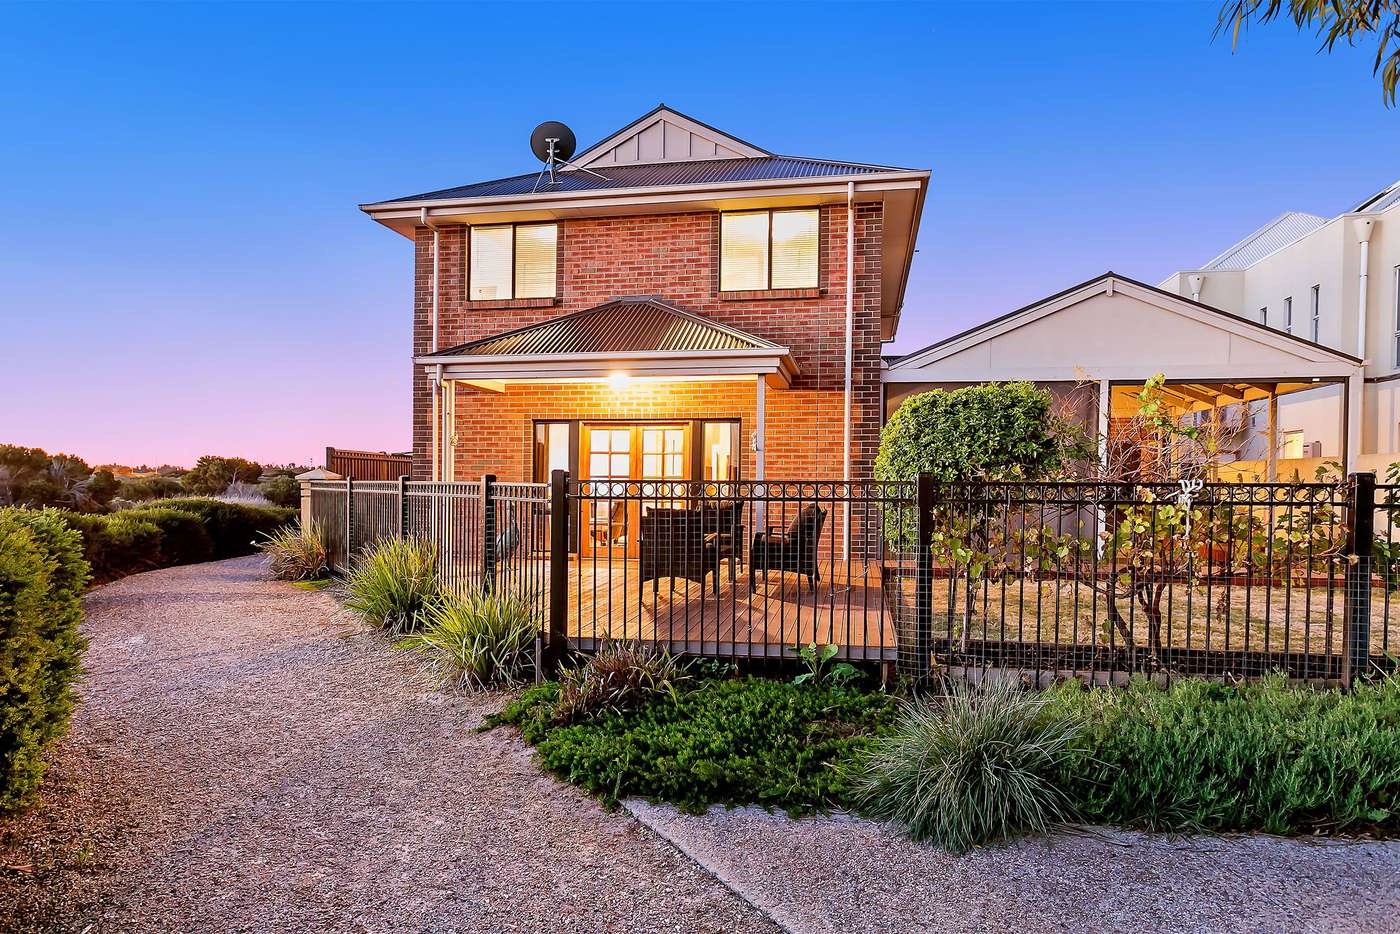 Main view of Homely house listing, 12 Pelican Lane, Mawson Lakes SA 5095